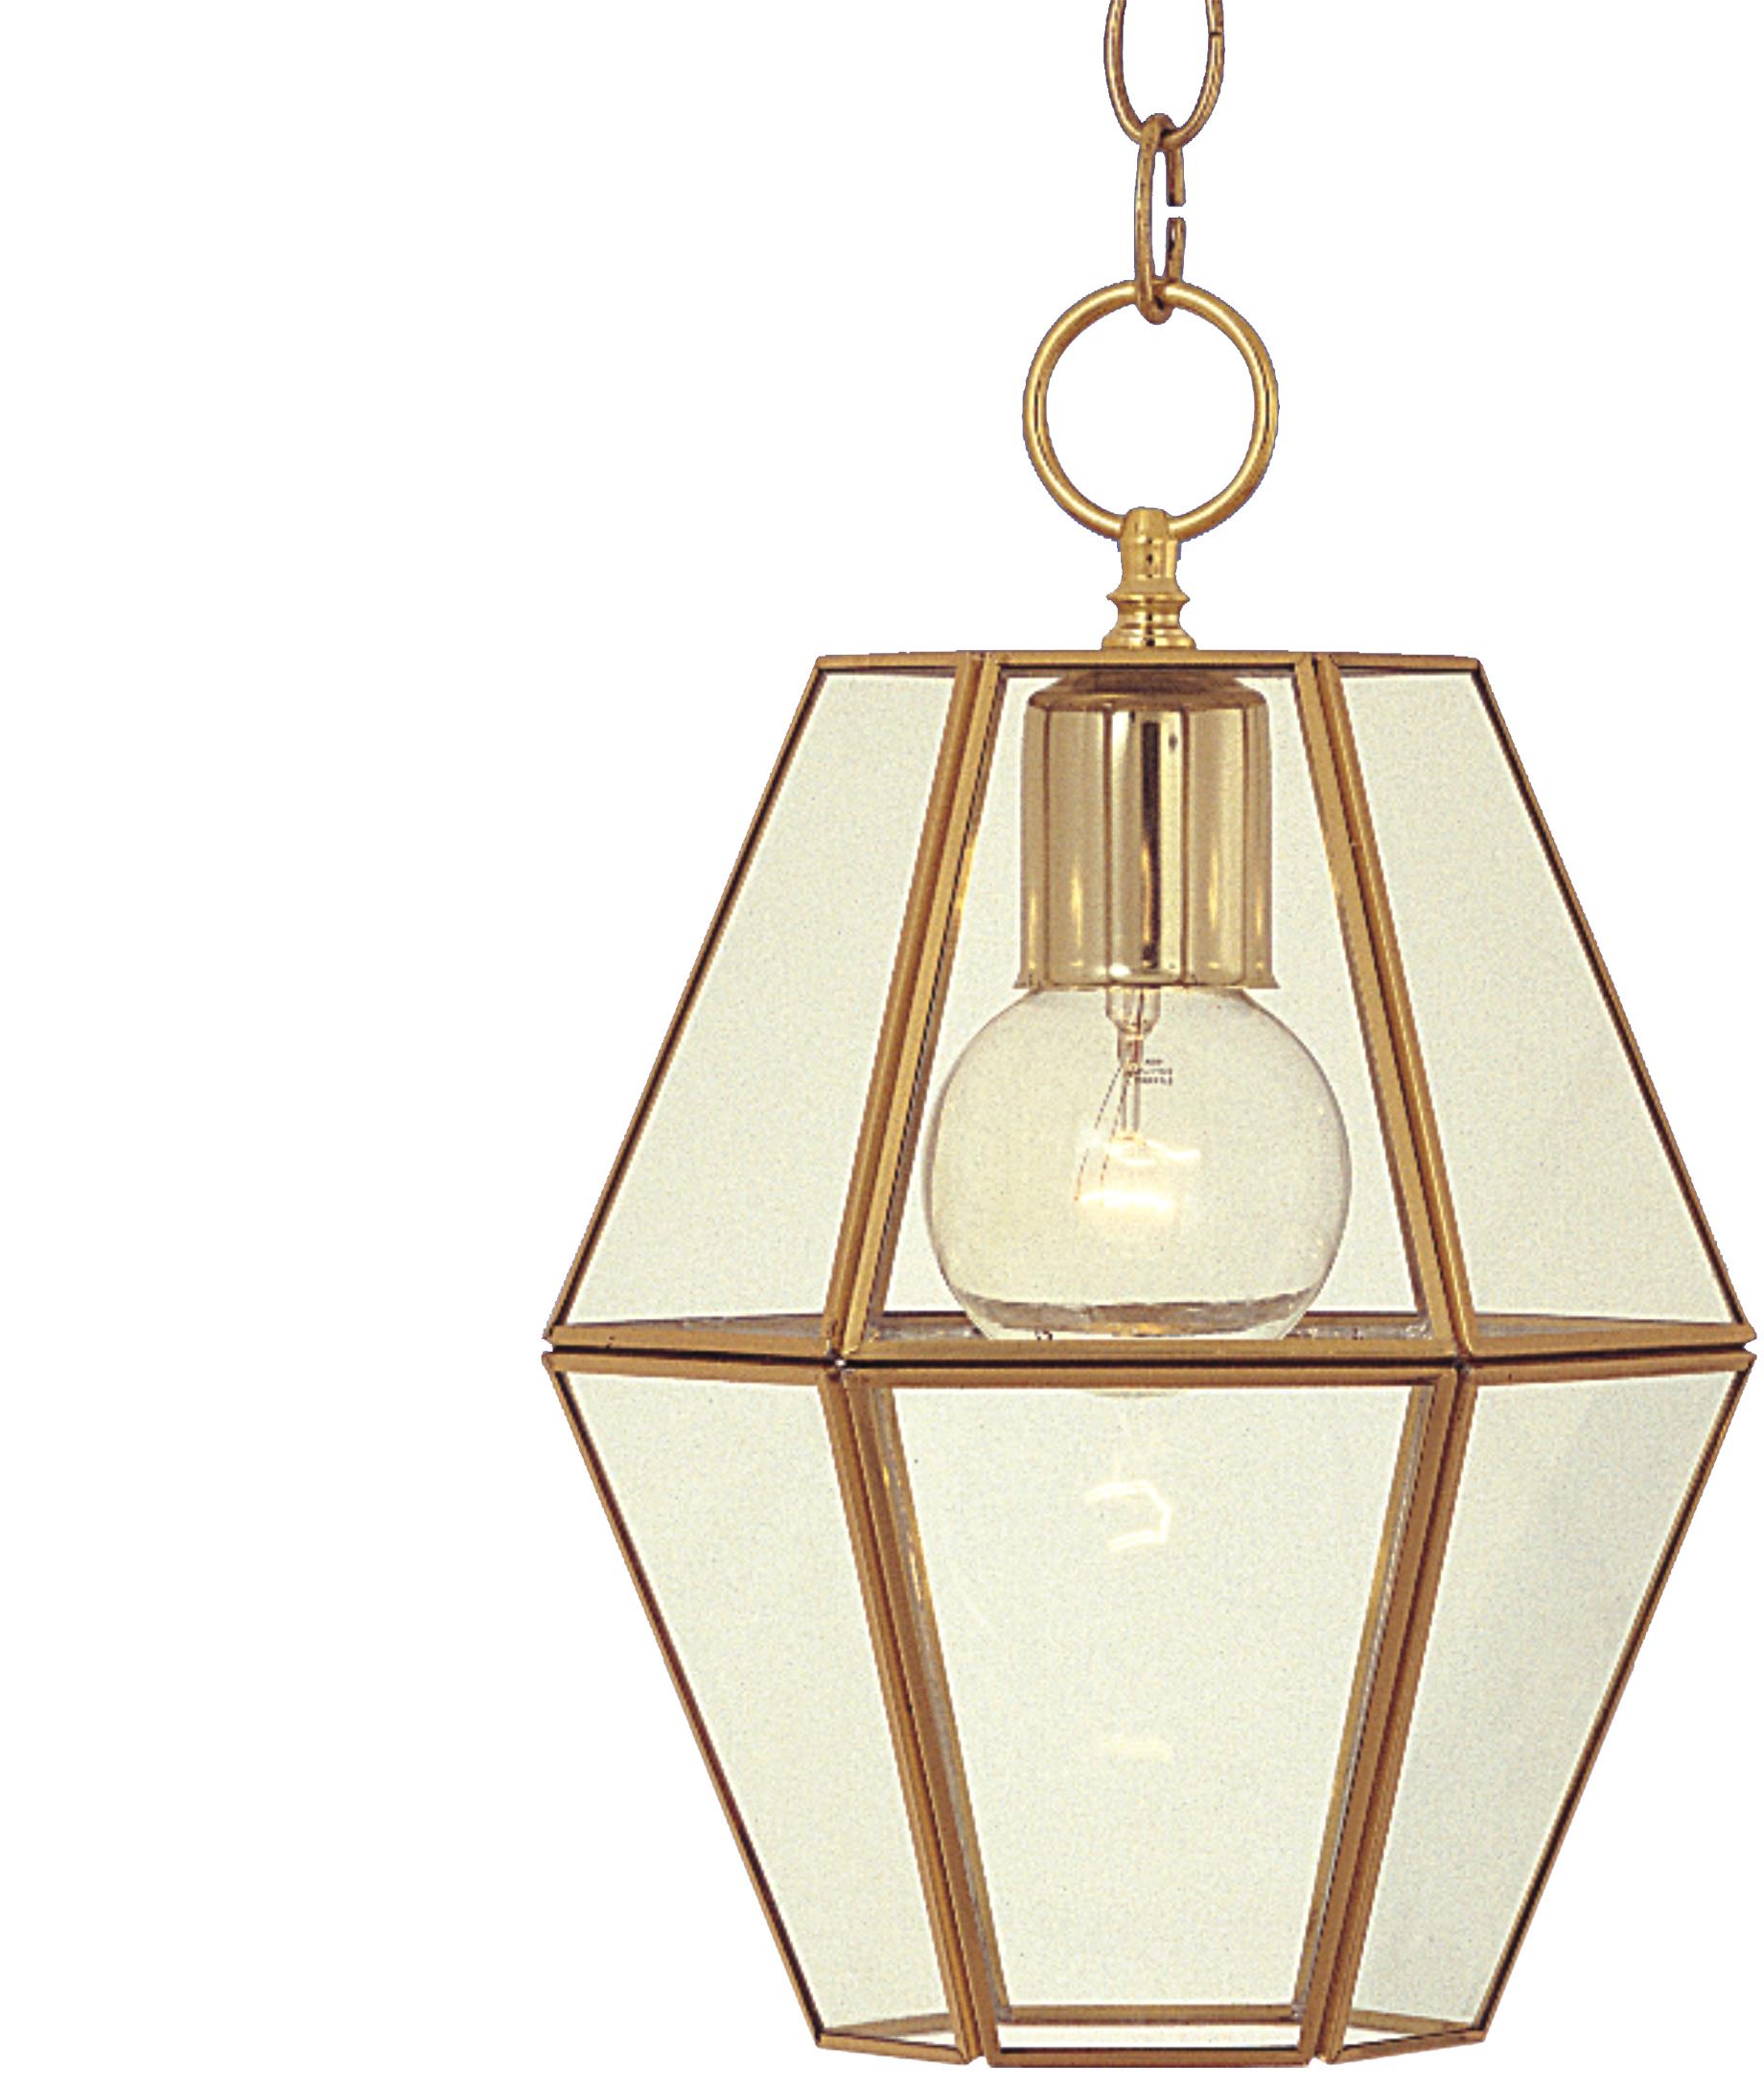 Foyer Lighting Replacement Glass : Bound glass light foyer entry pendant maxim